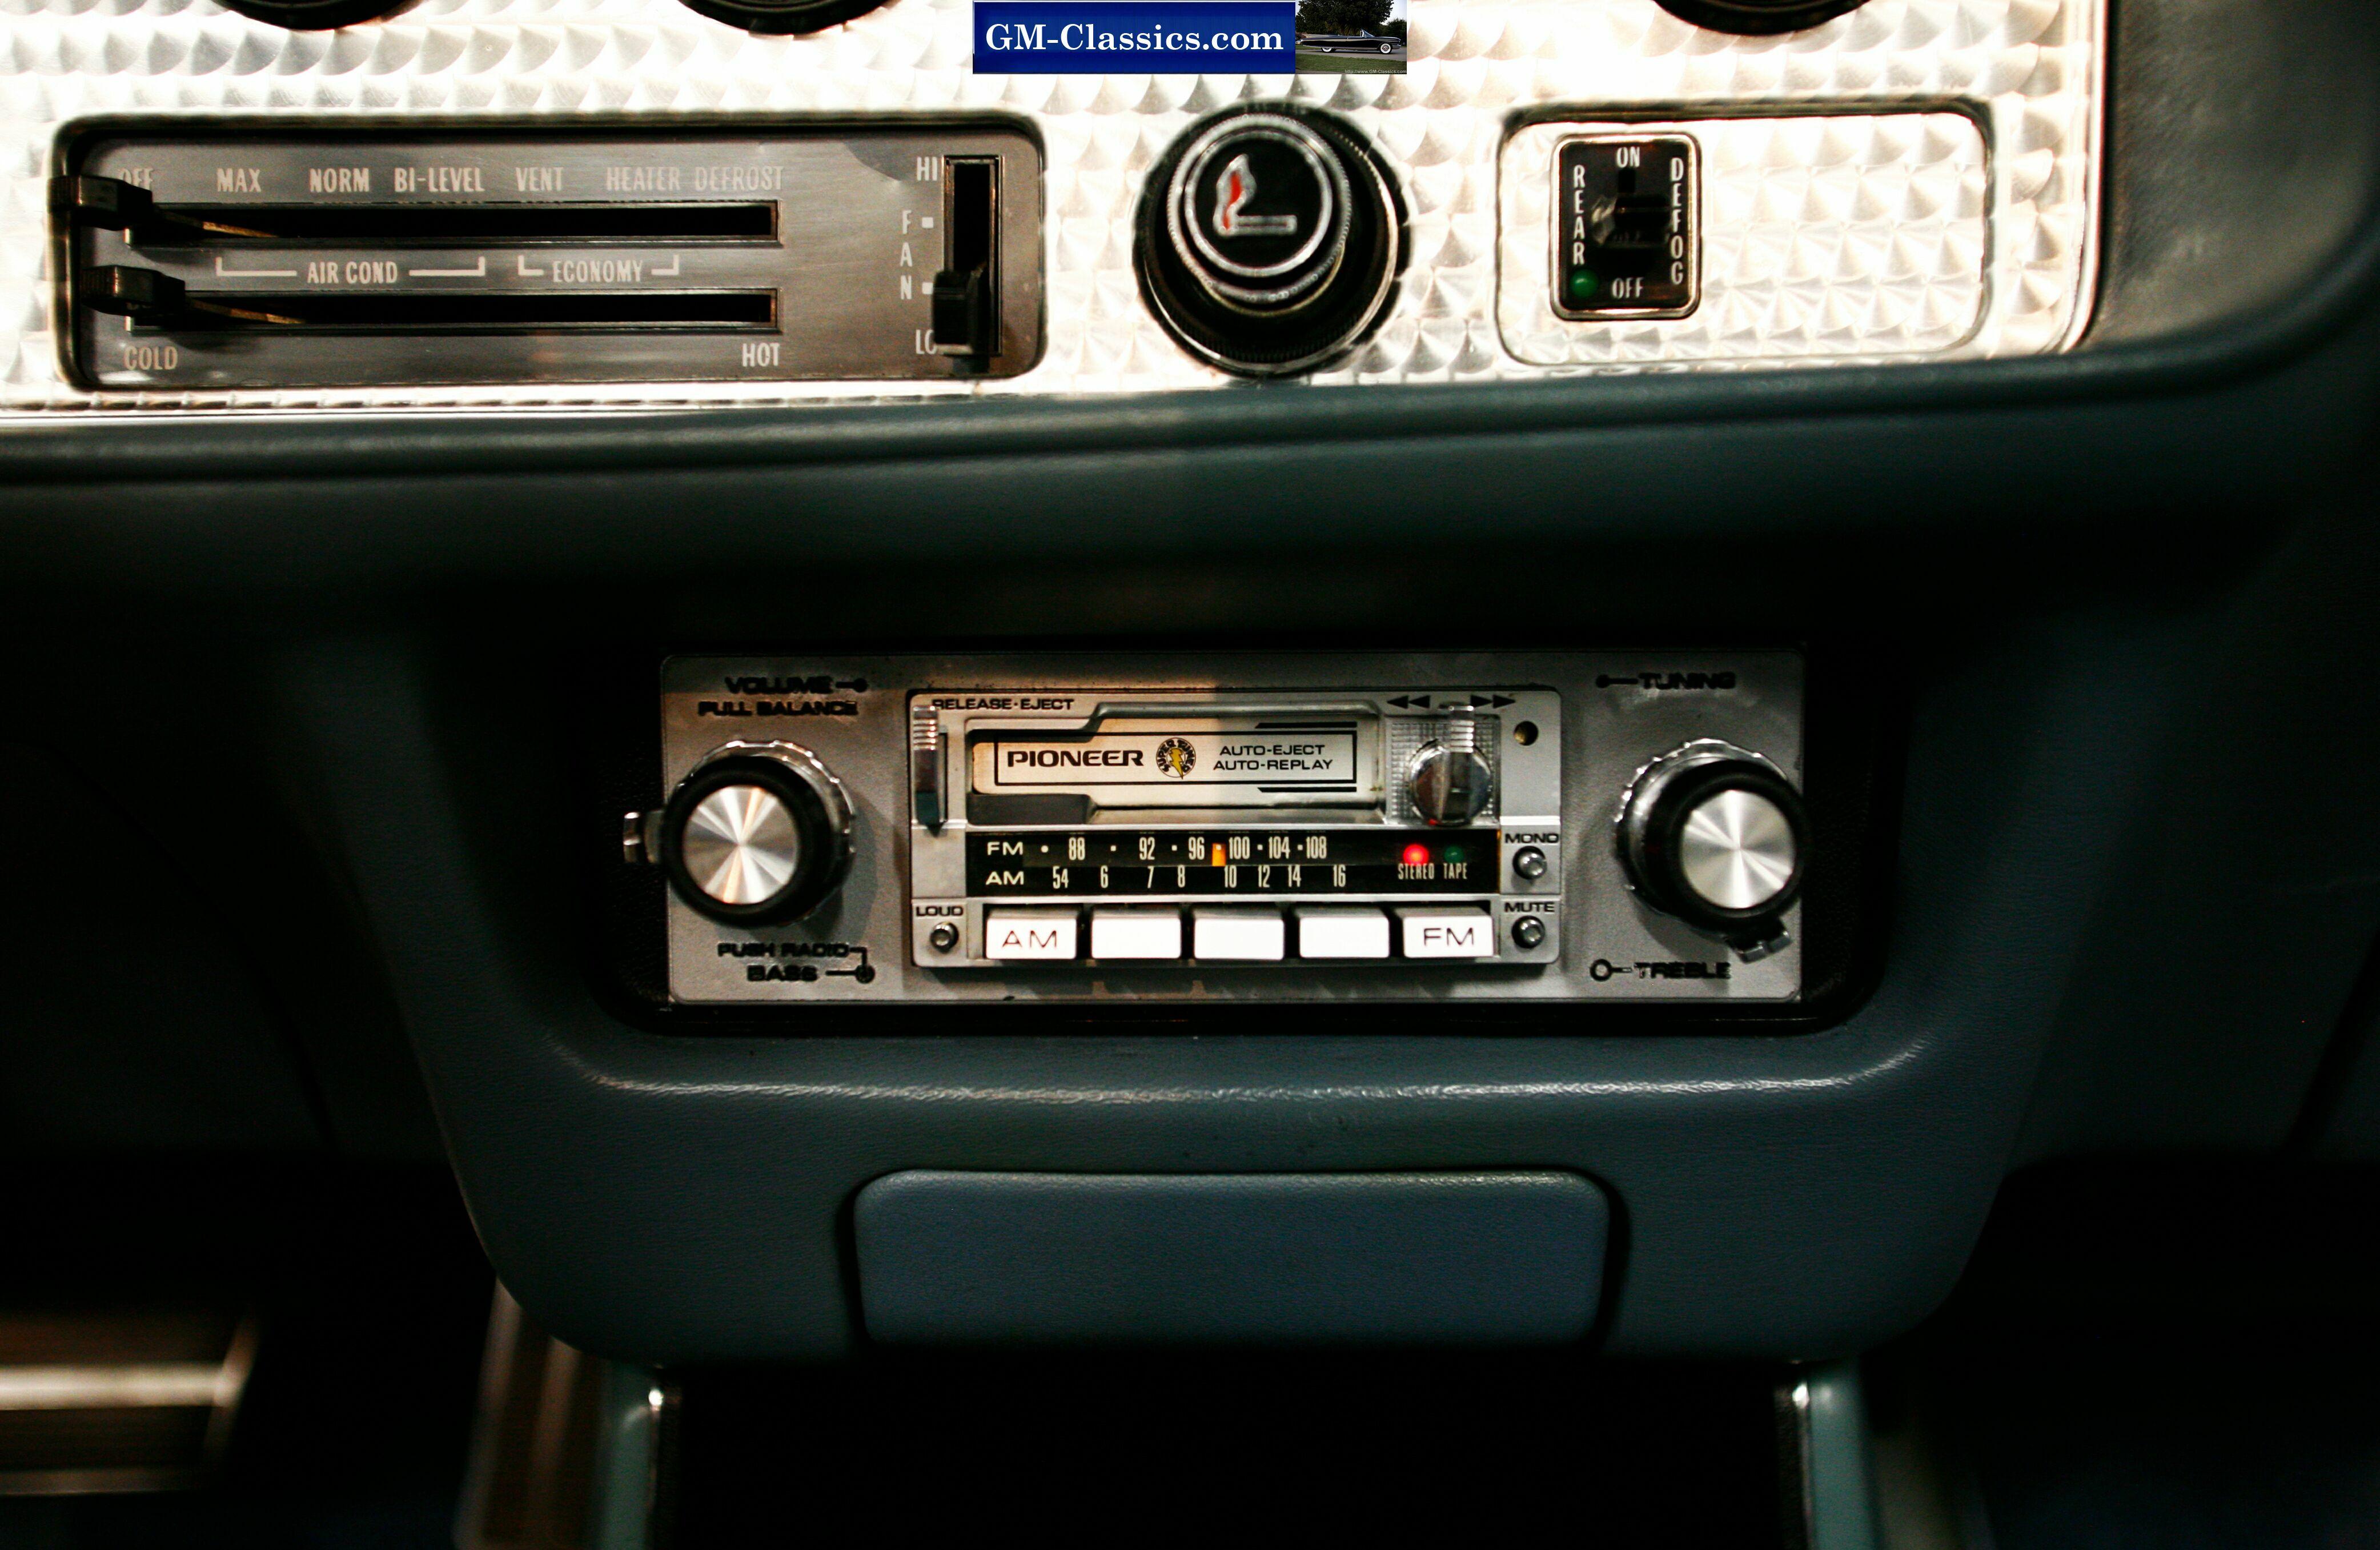 1979 Pontiac Trans Am Matt Garrett Clarion Car Stereo Wiring Diagram Besides Gm Radio The Pioneer Kpx 9000